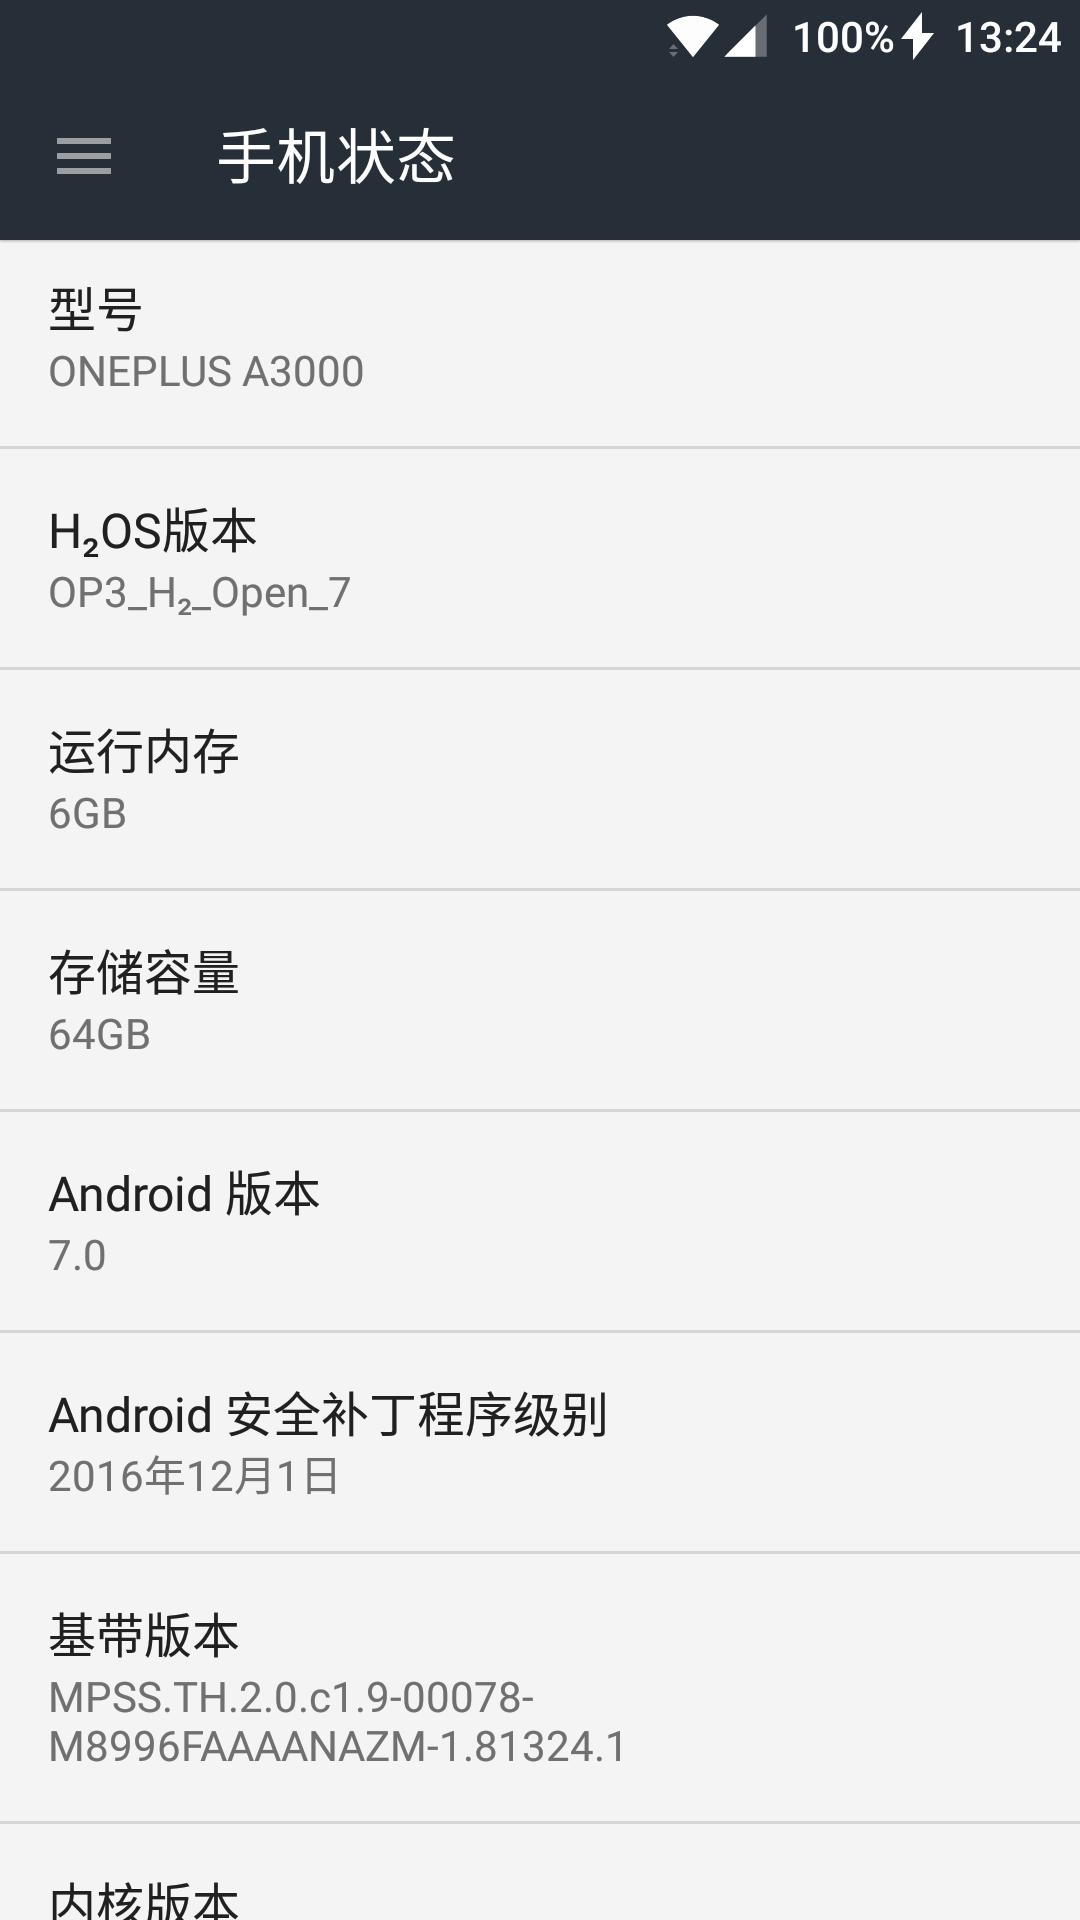 Screenshot_20170112-132413.png